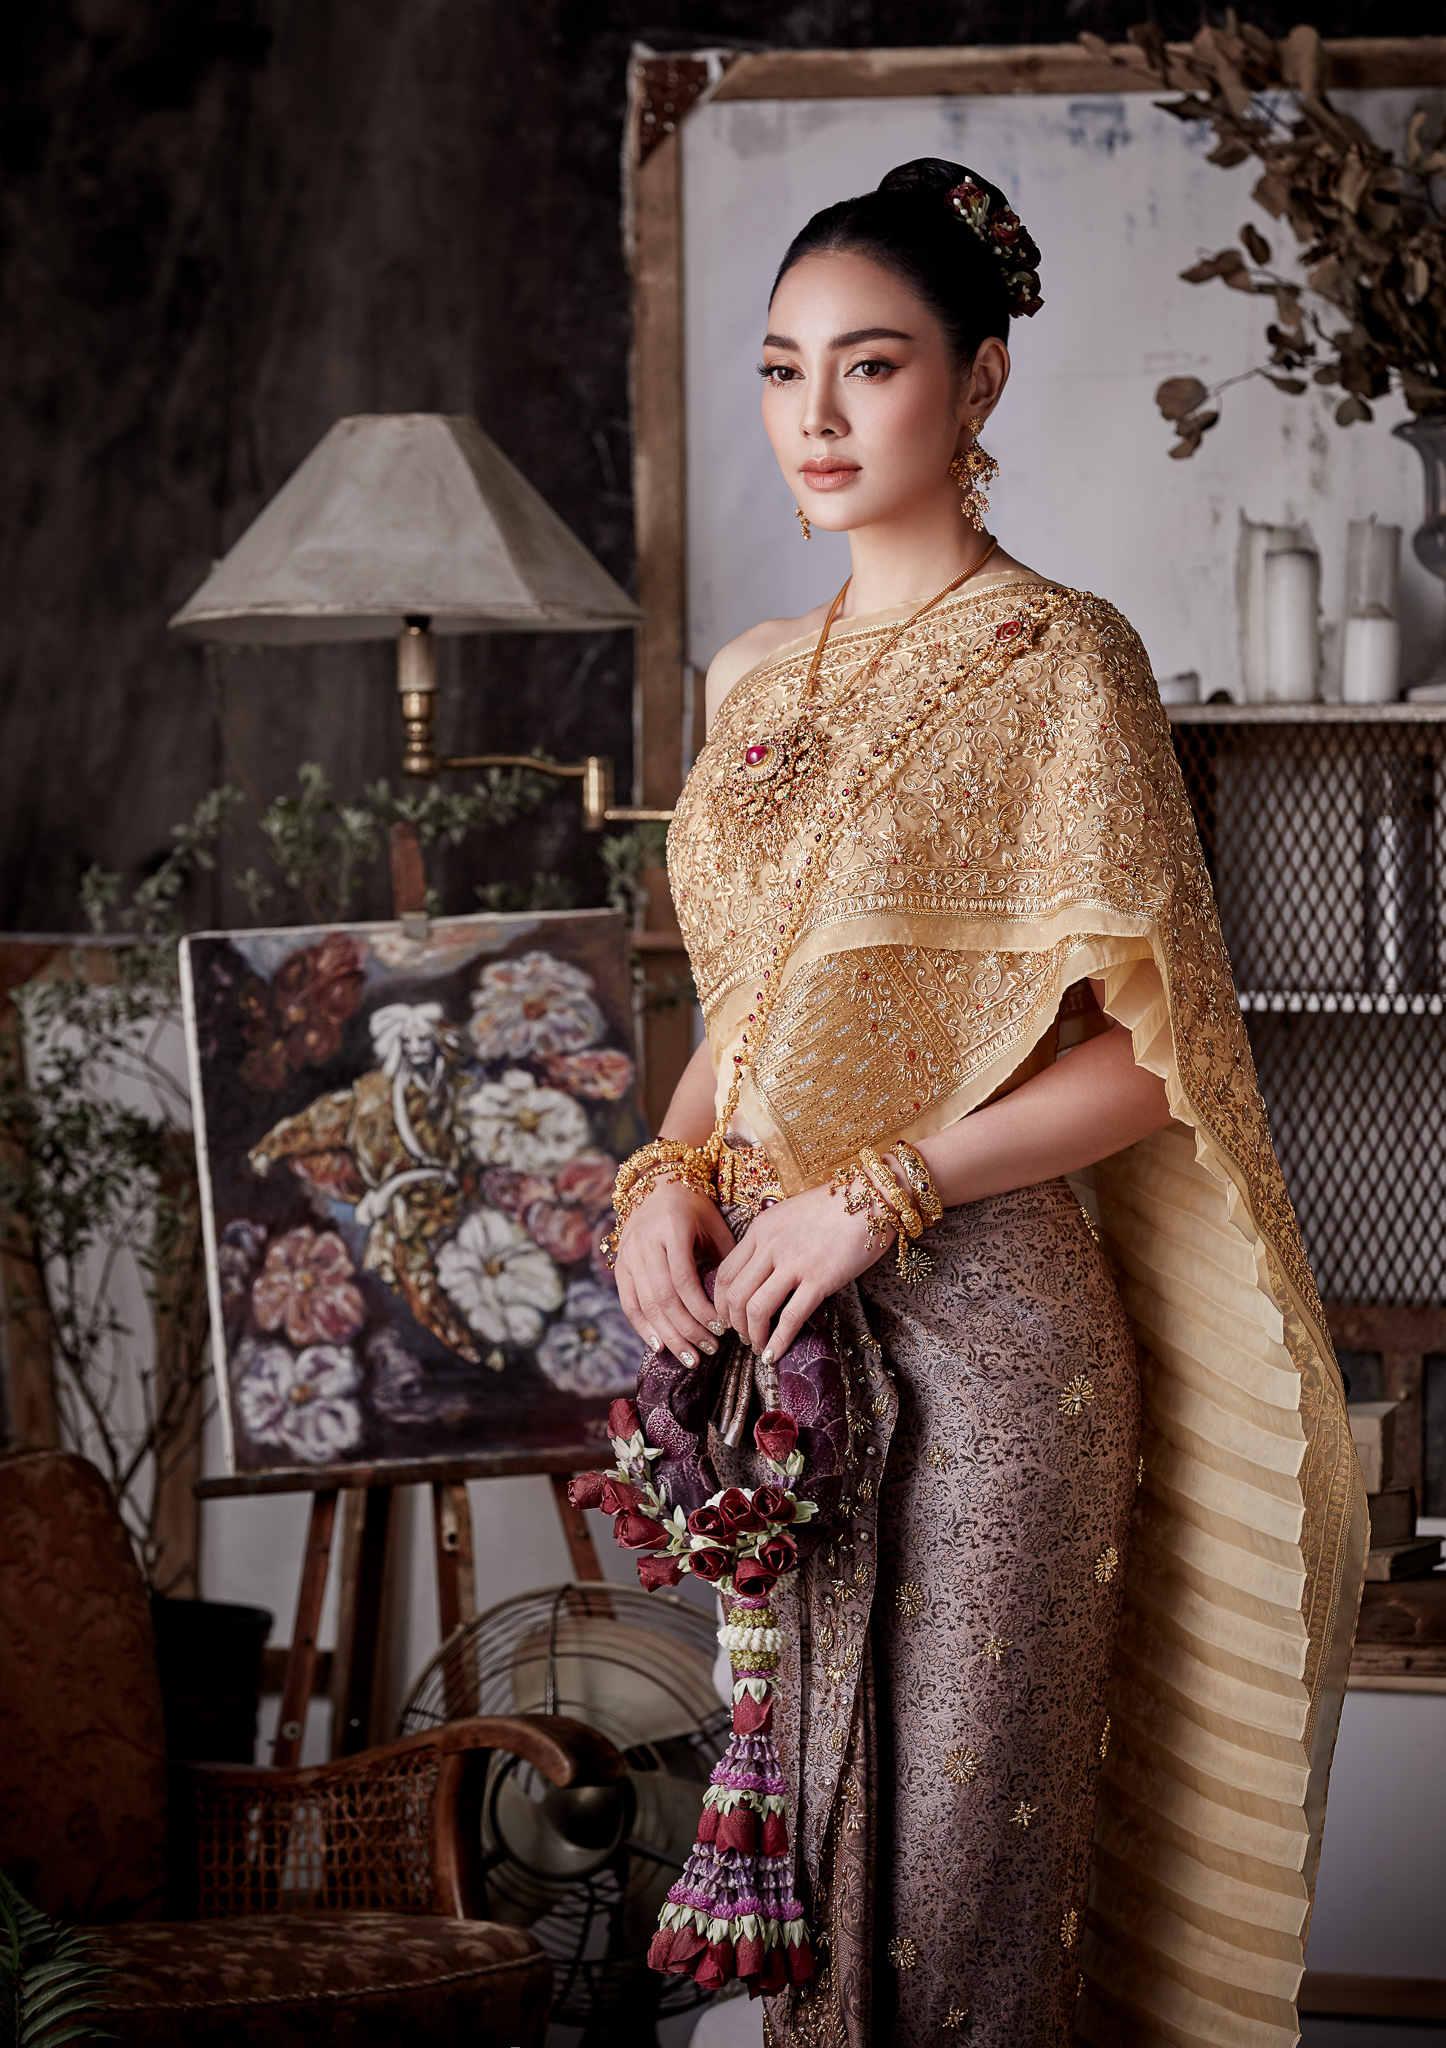 Thai traditional dress - Tak 01